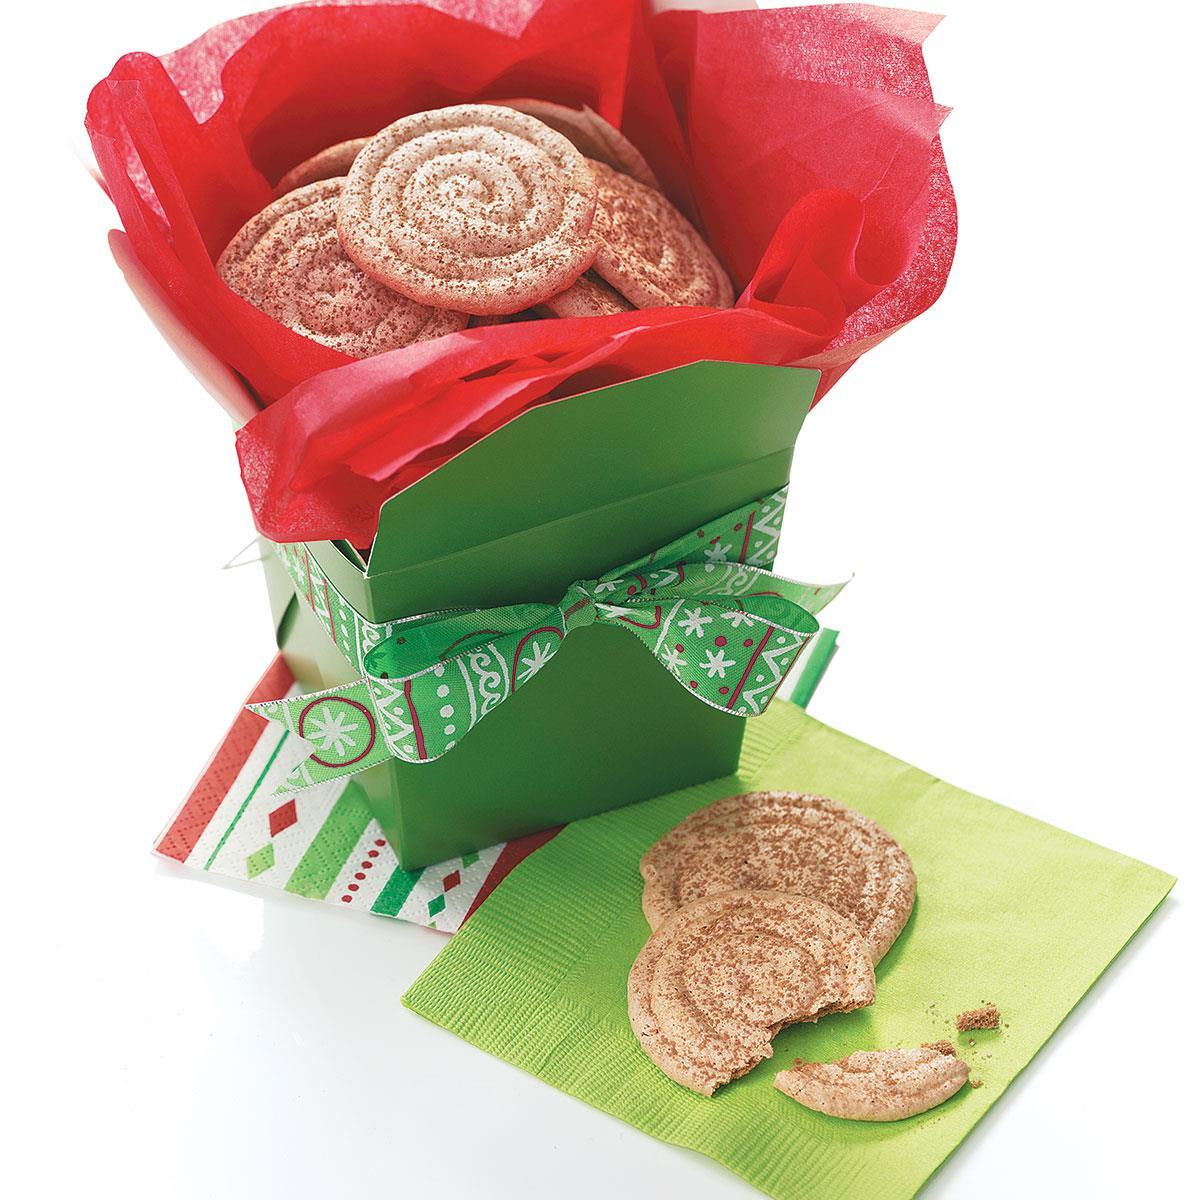 Cocoa-Almond Meringue Cookies image